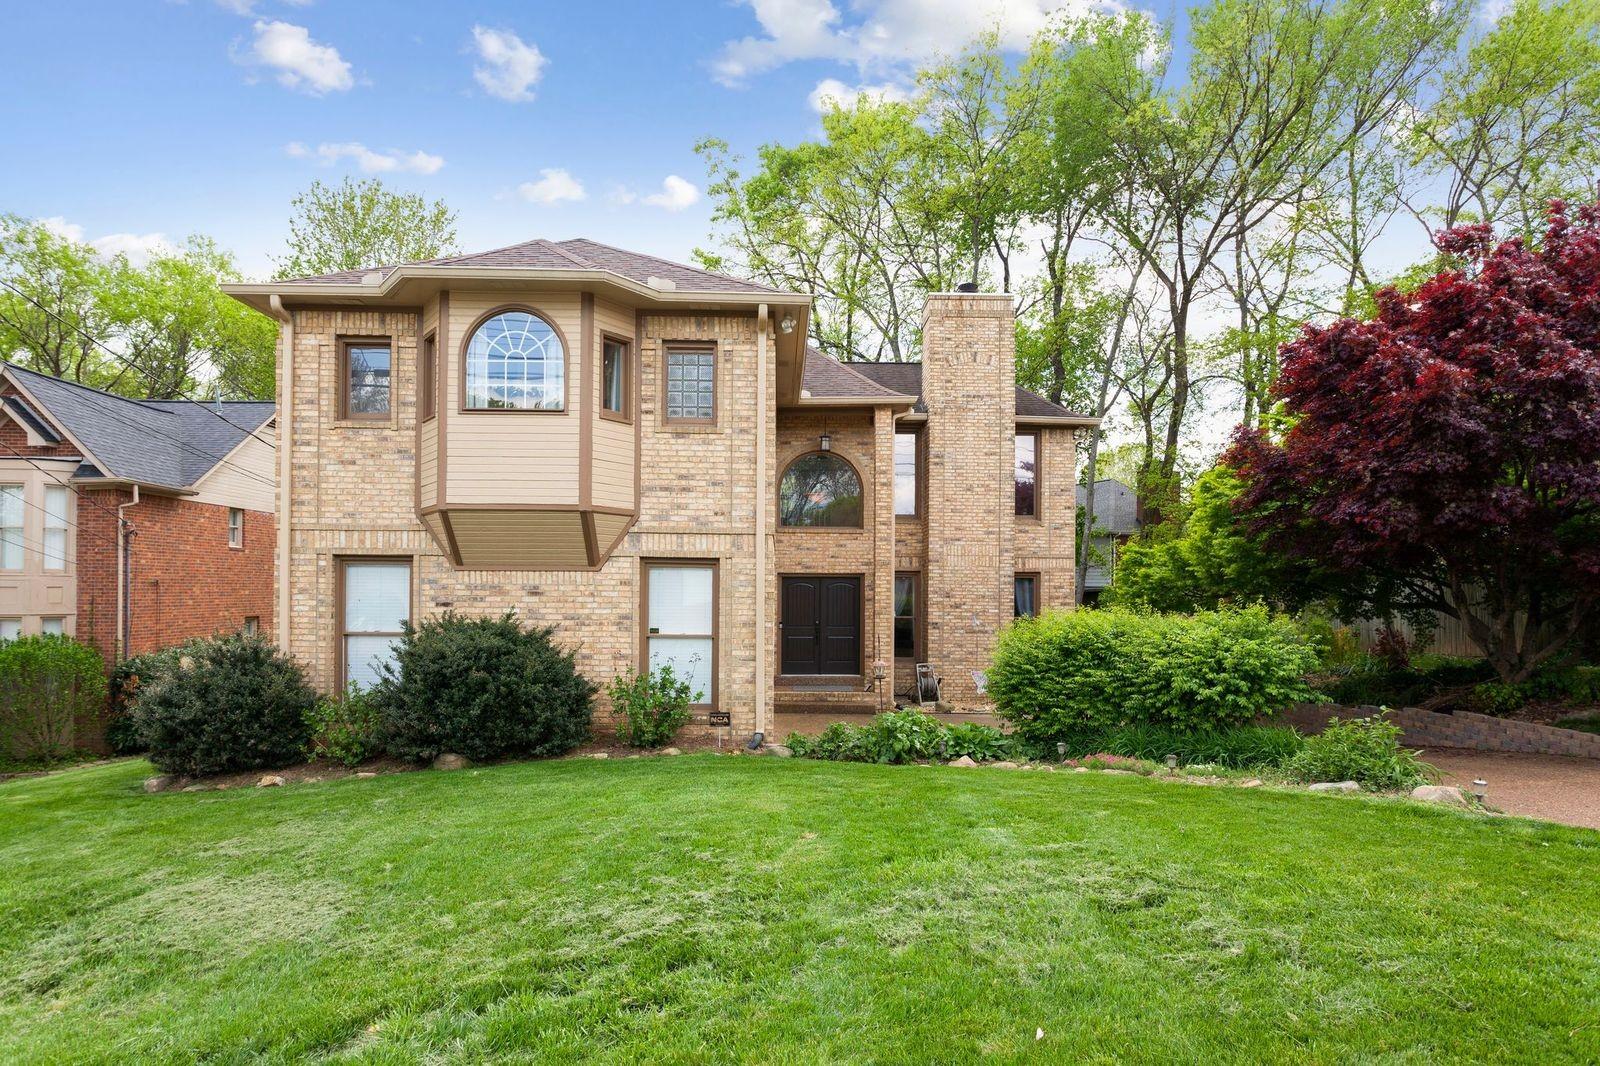 7025 Poplar Creek Trace Property Photo - Nashville, TN real estate listing